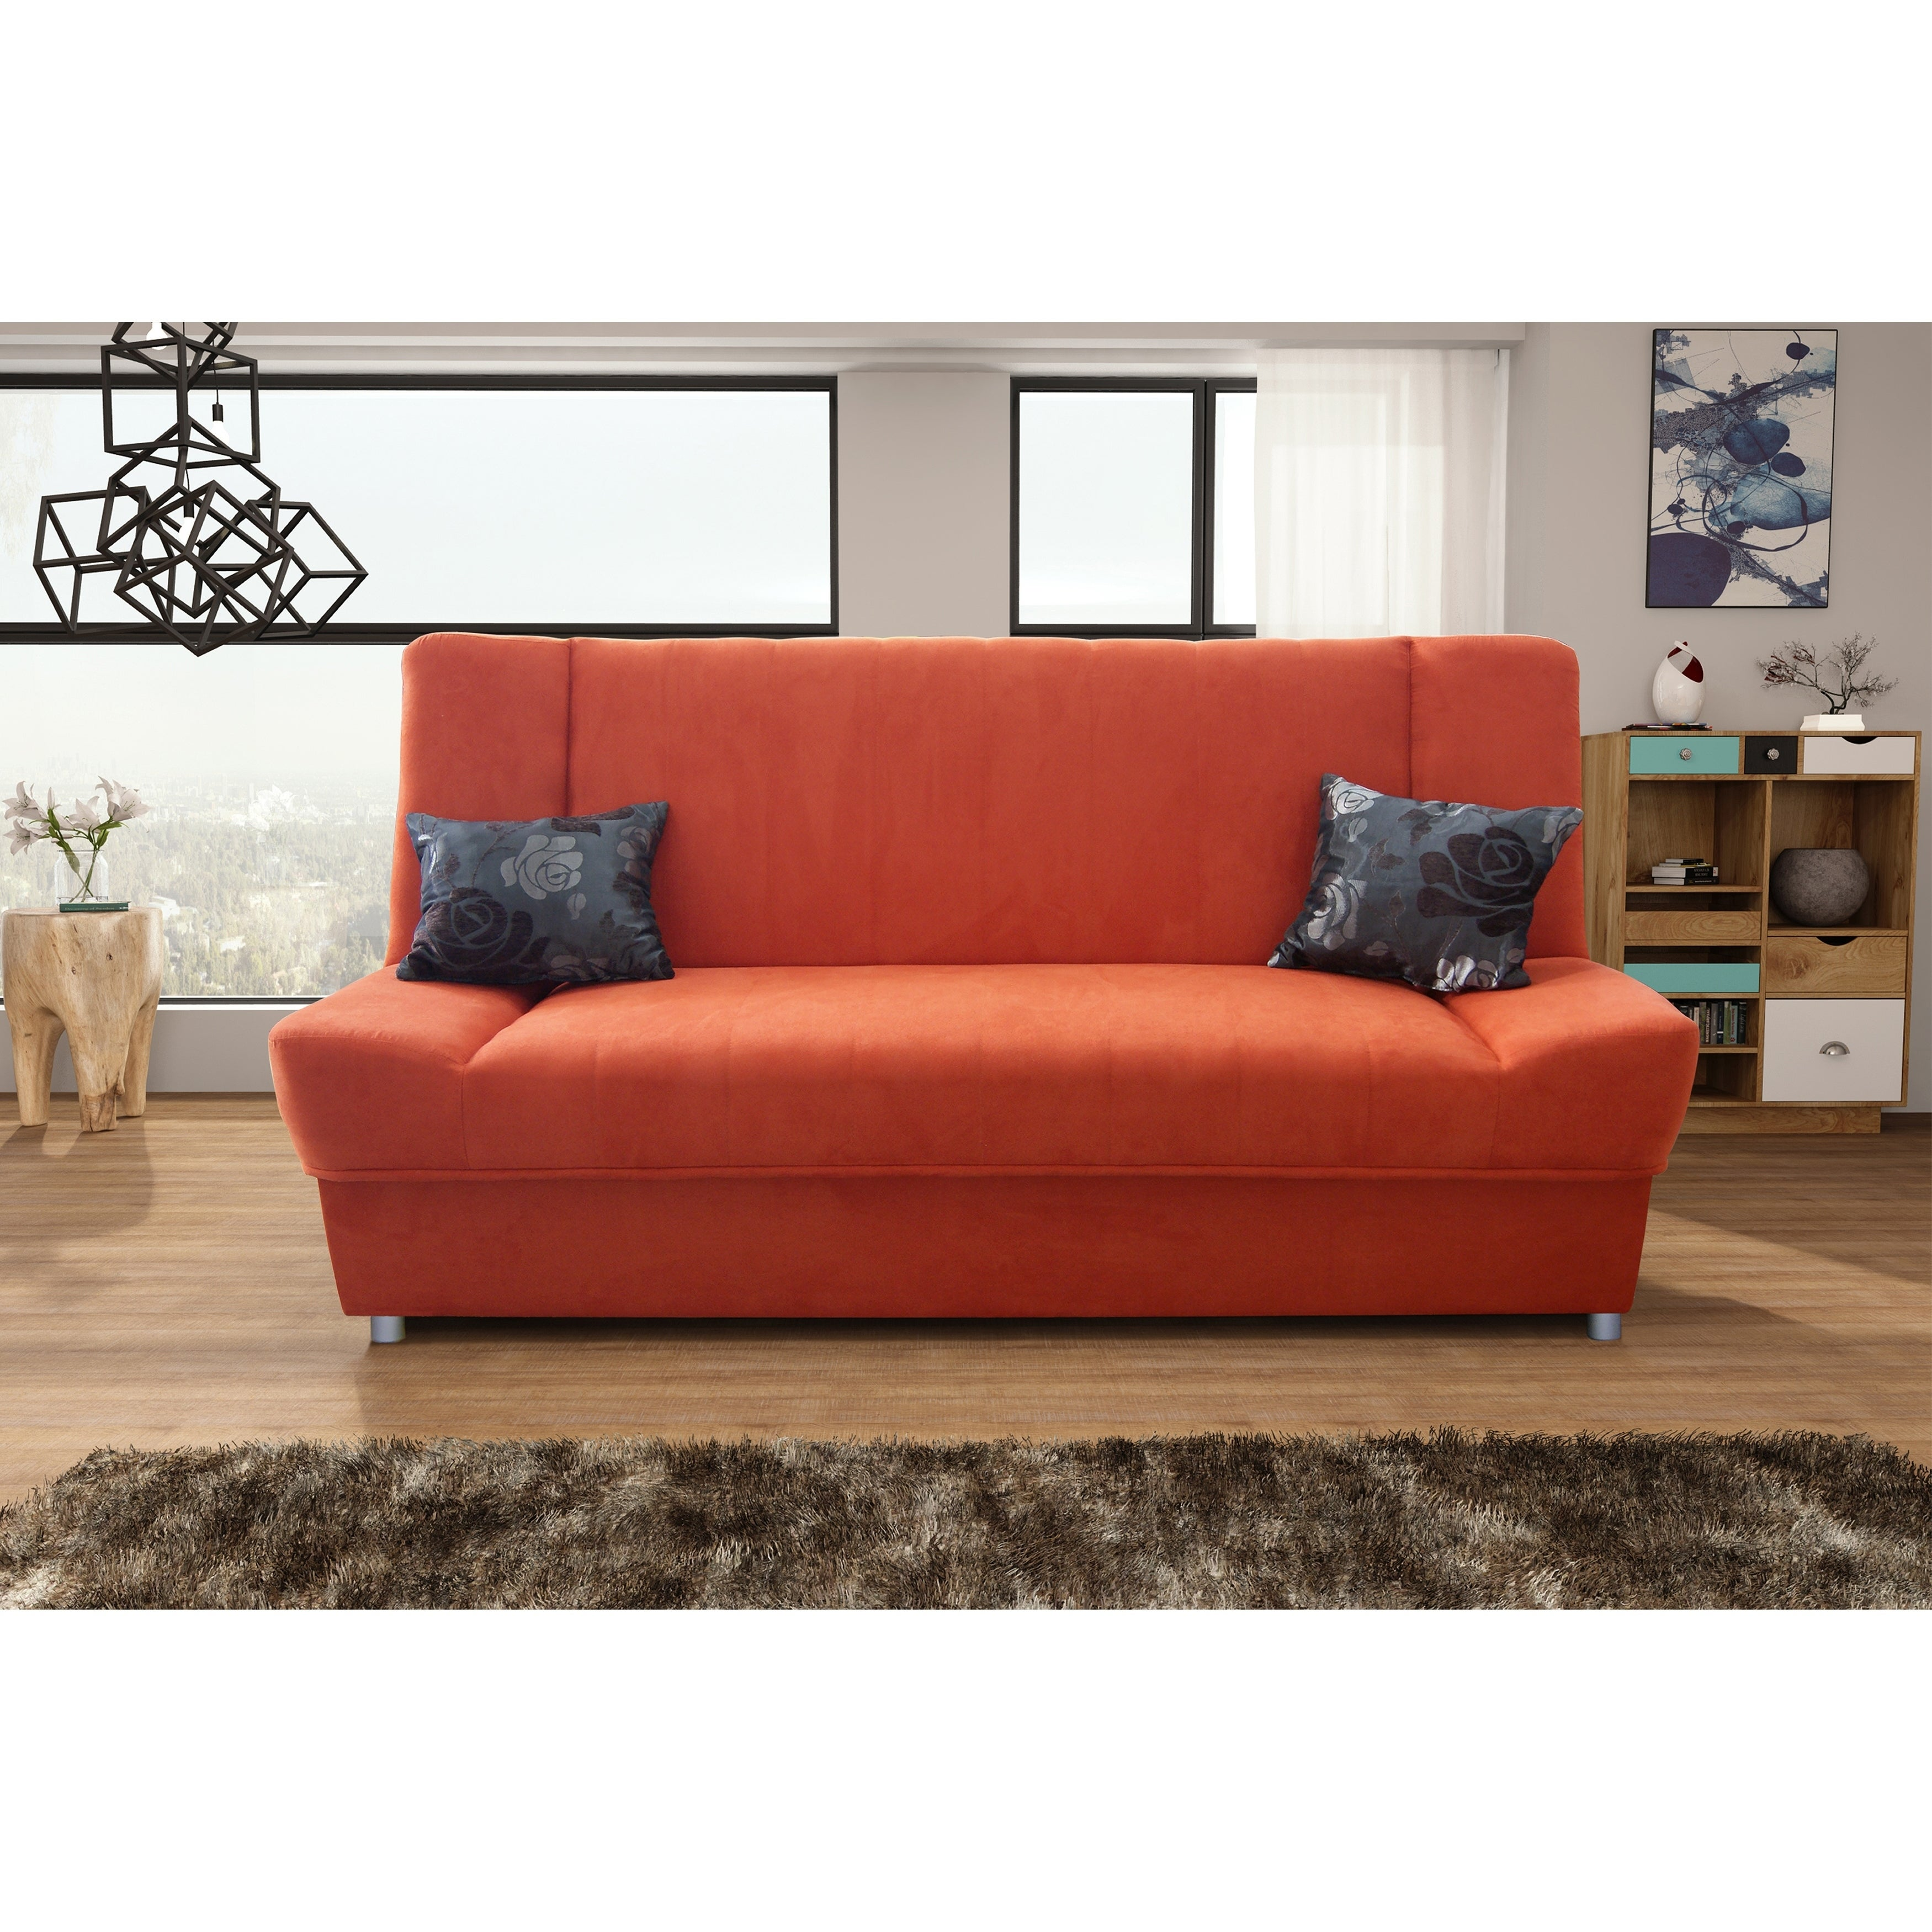 - Shop Arlington Orange Fabric Armless Sleeper Sofa With Storage